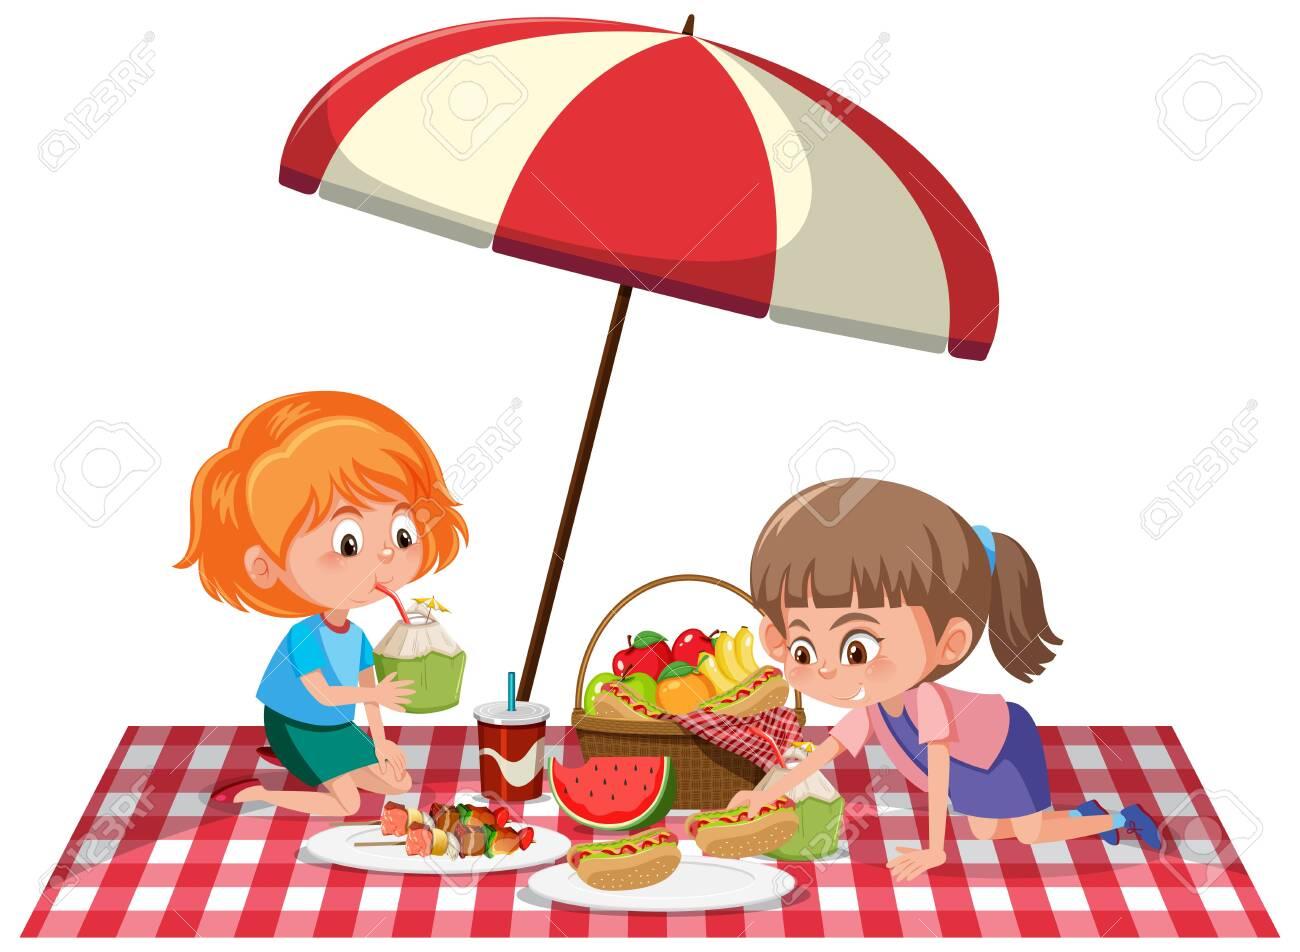 Two girls having picnic on white background illustration - 146498115